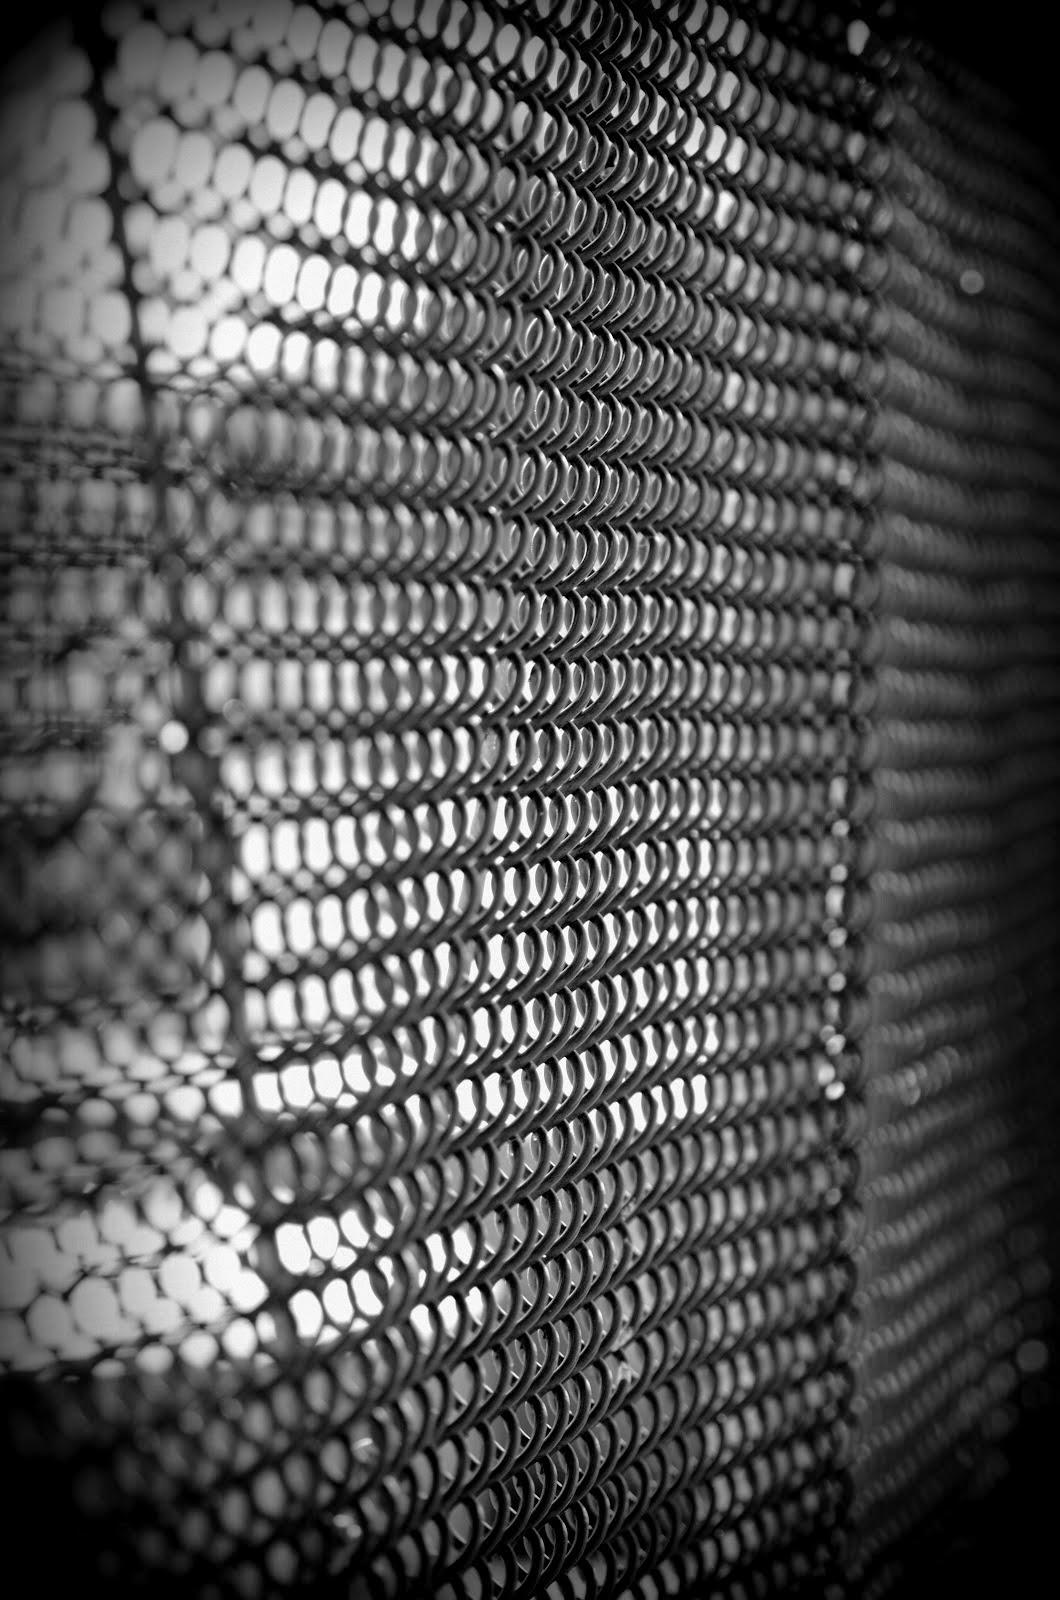 خلفيات ايفون- خلفيات اندرويد HD